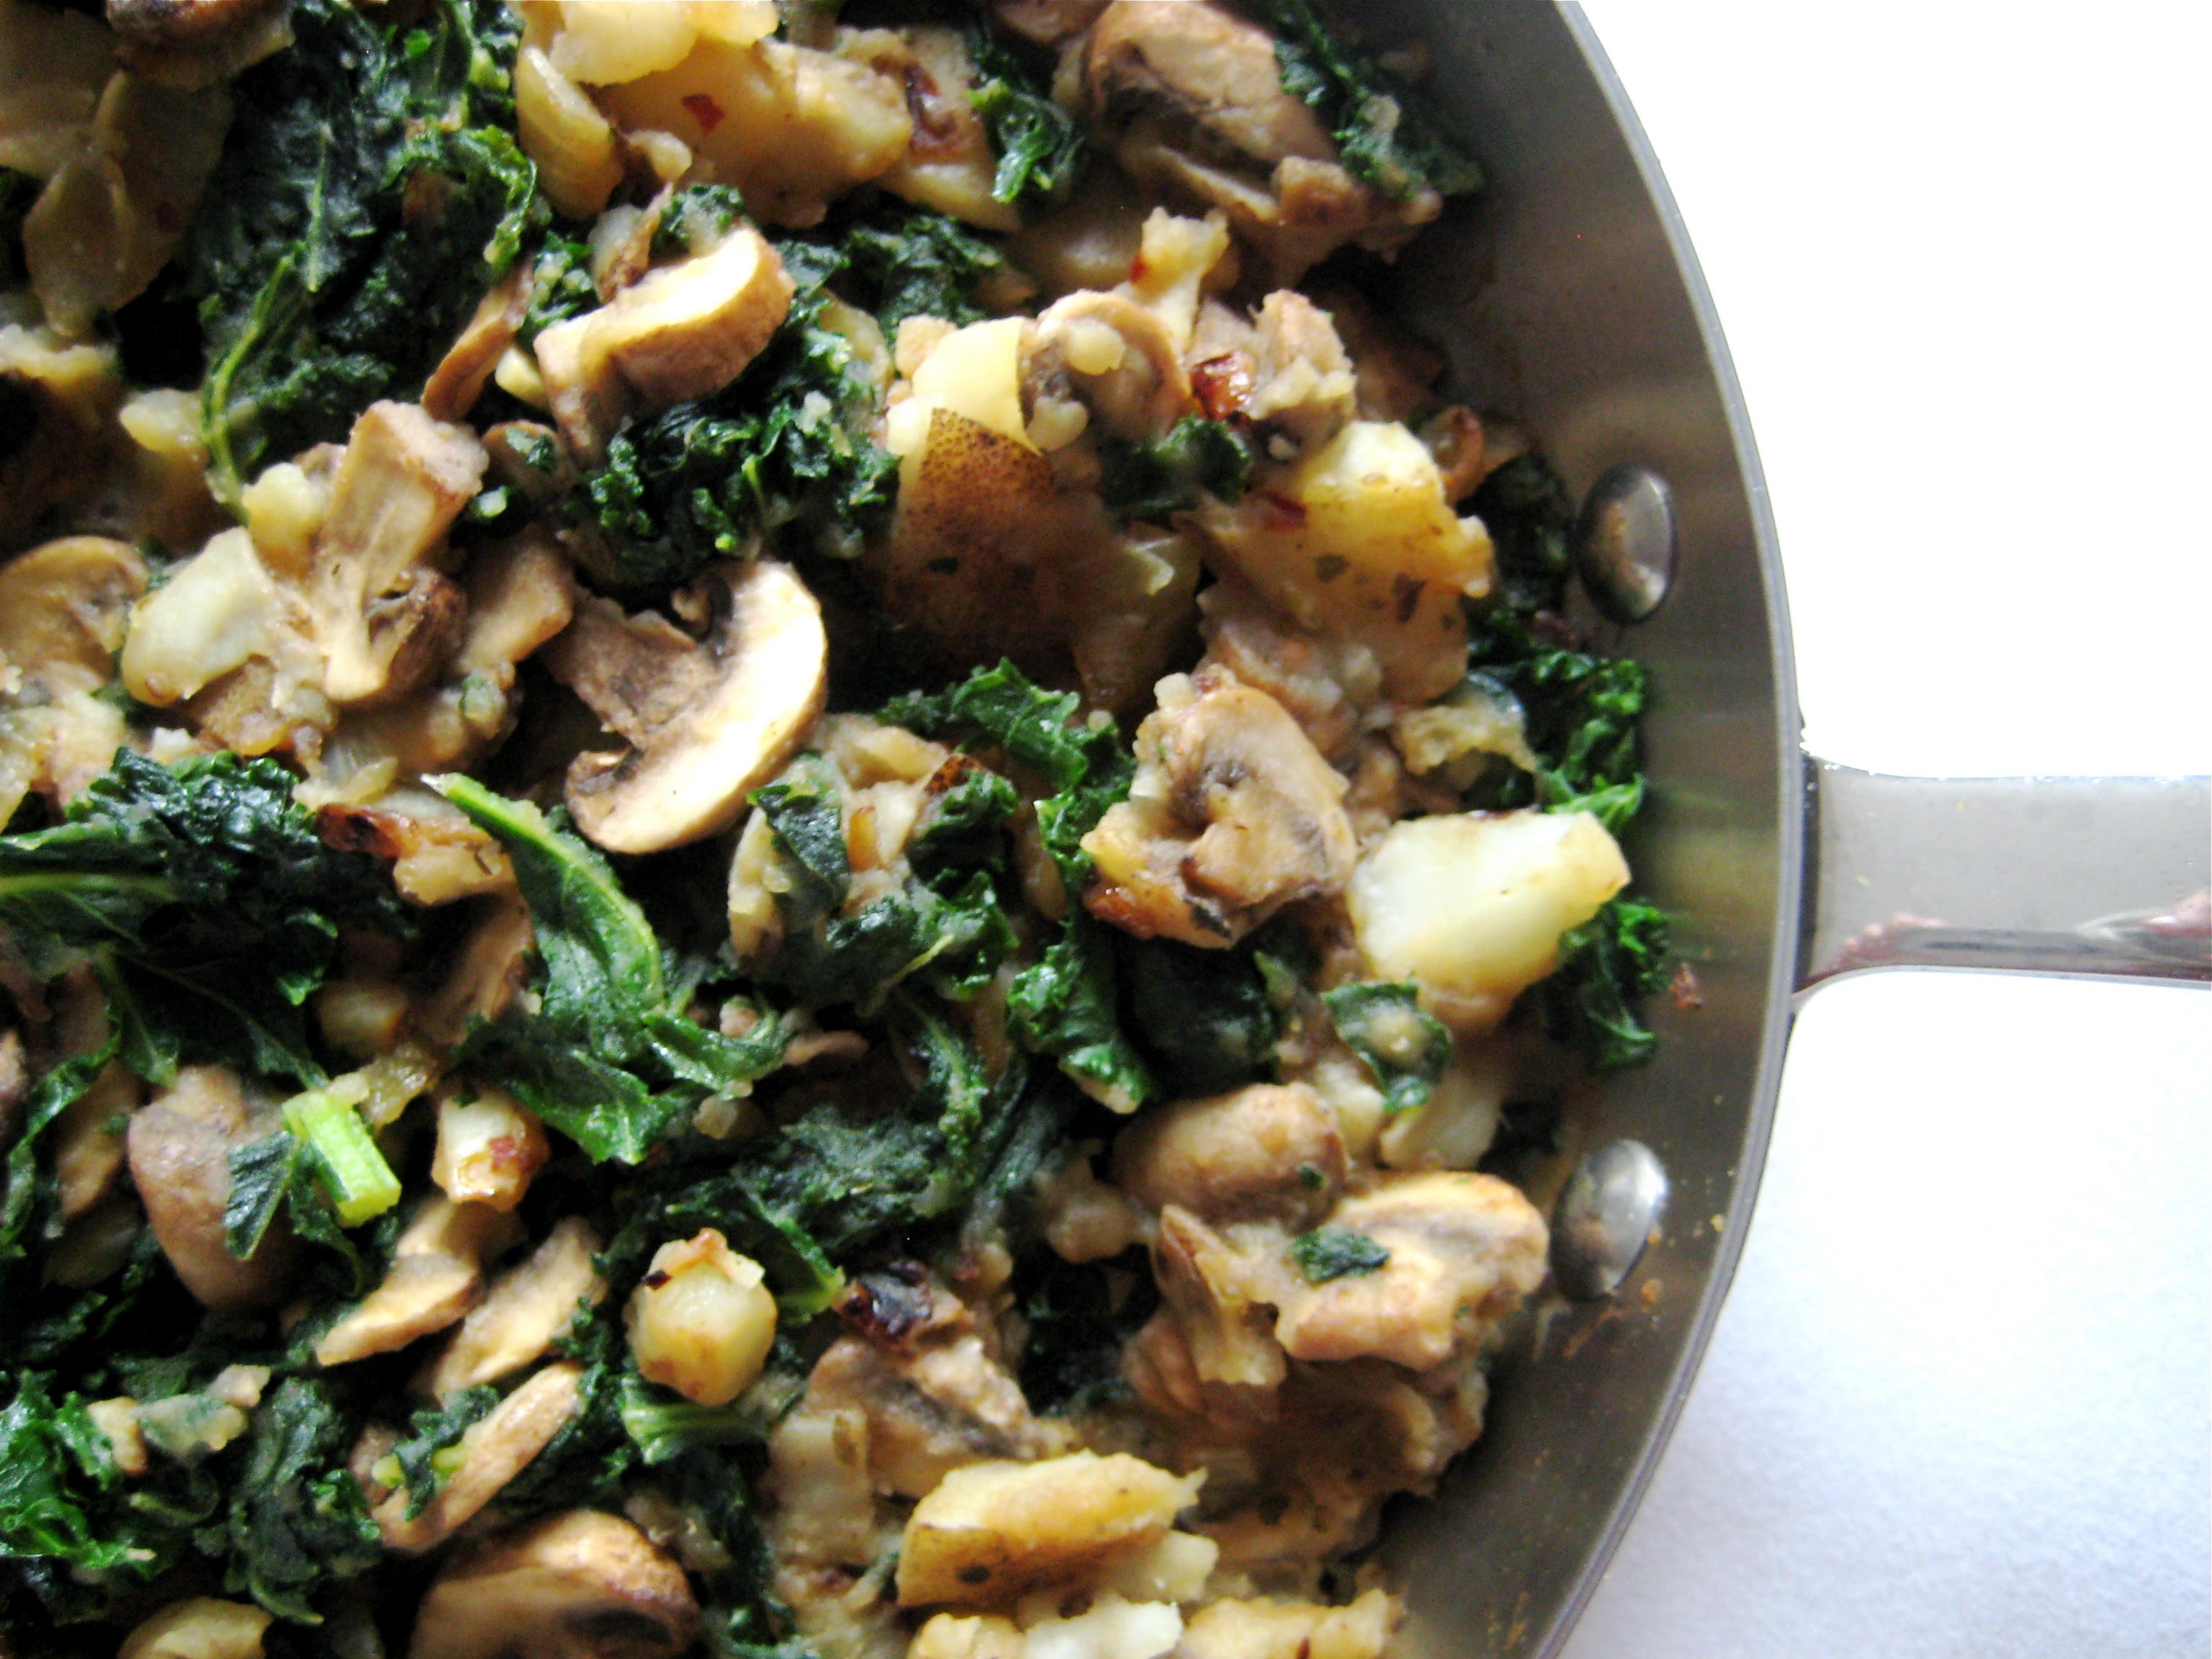 Kale potato and mushroom skillet laurie sadowski potato kale mushroom skillet forumfinder Images